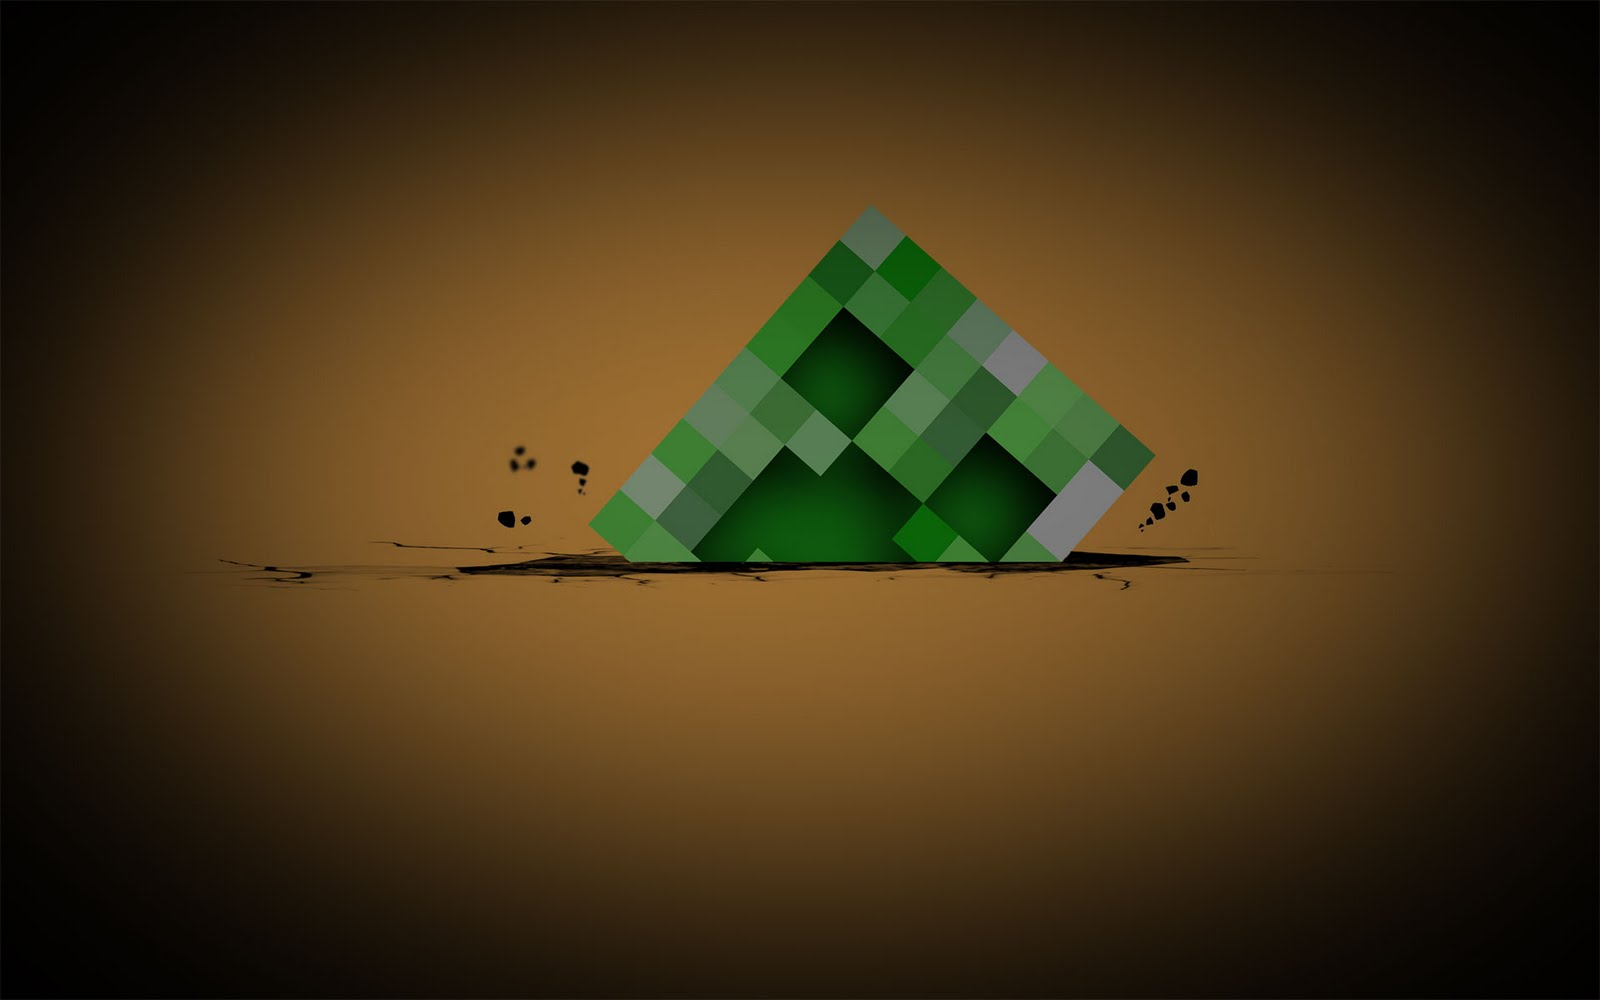 Minecraft Creeper Wallpaper WaLLDesK 1600x1000